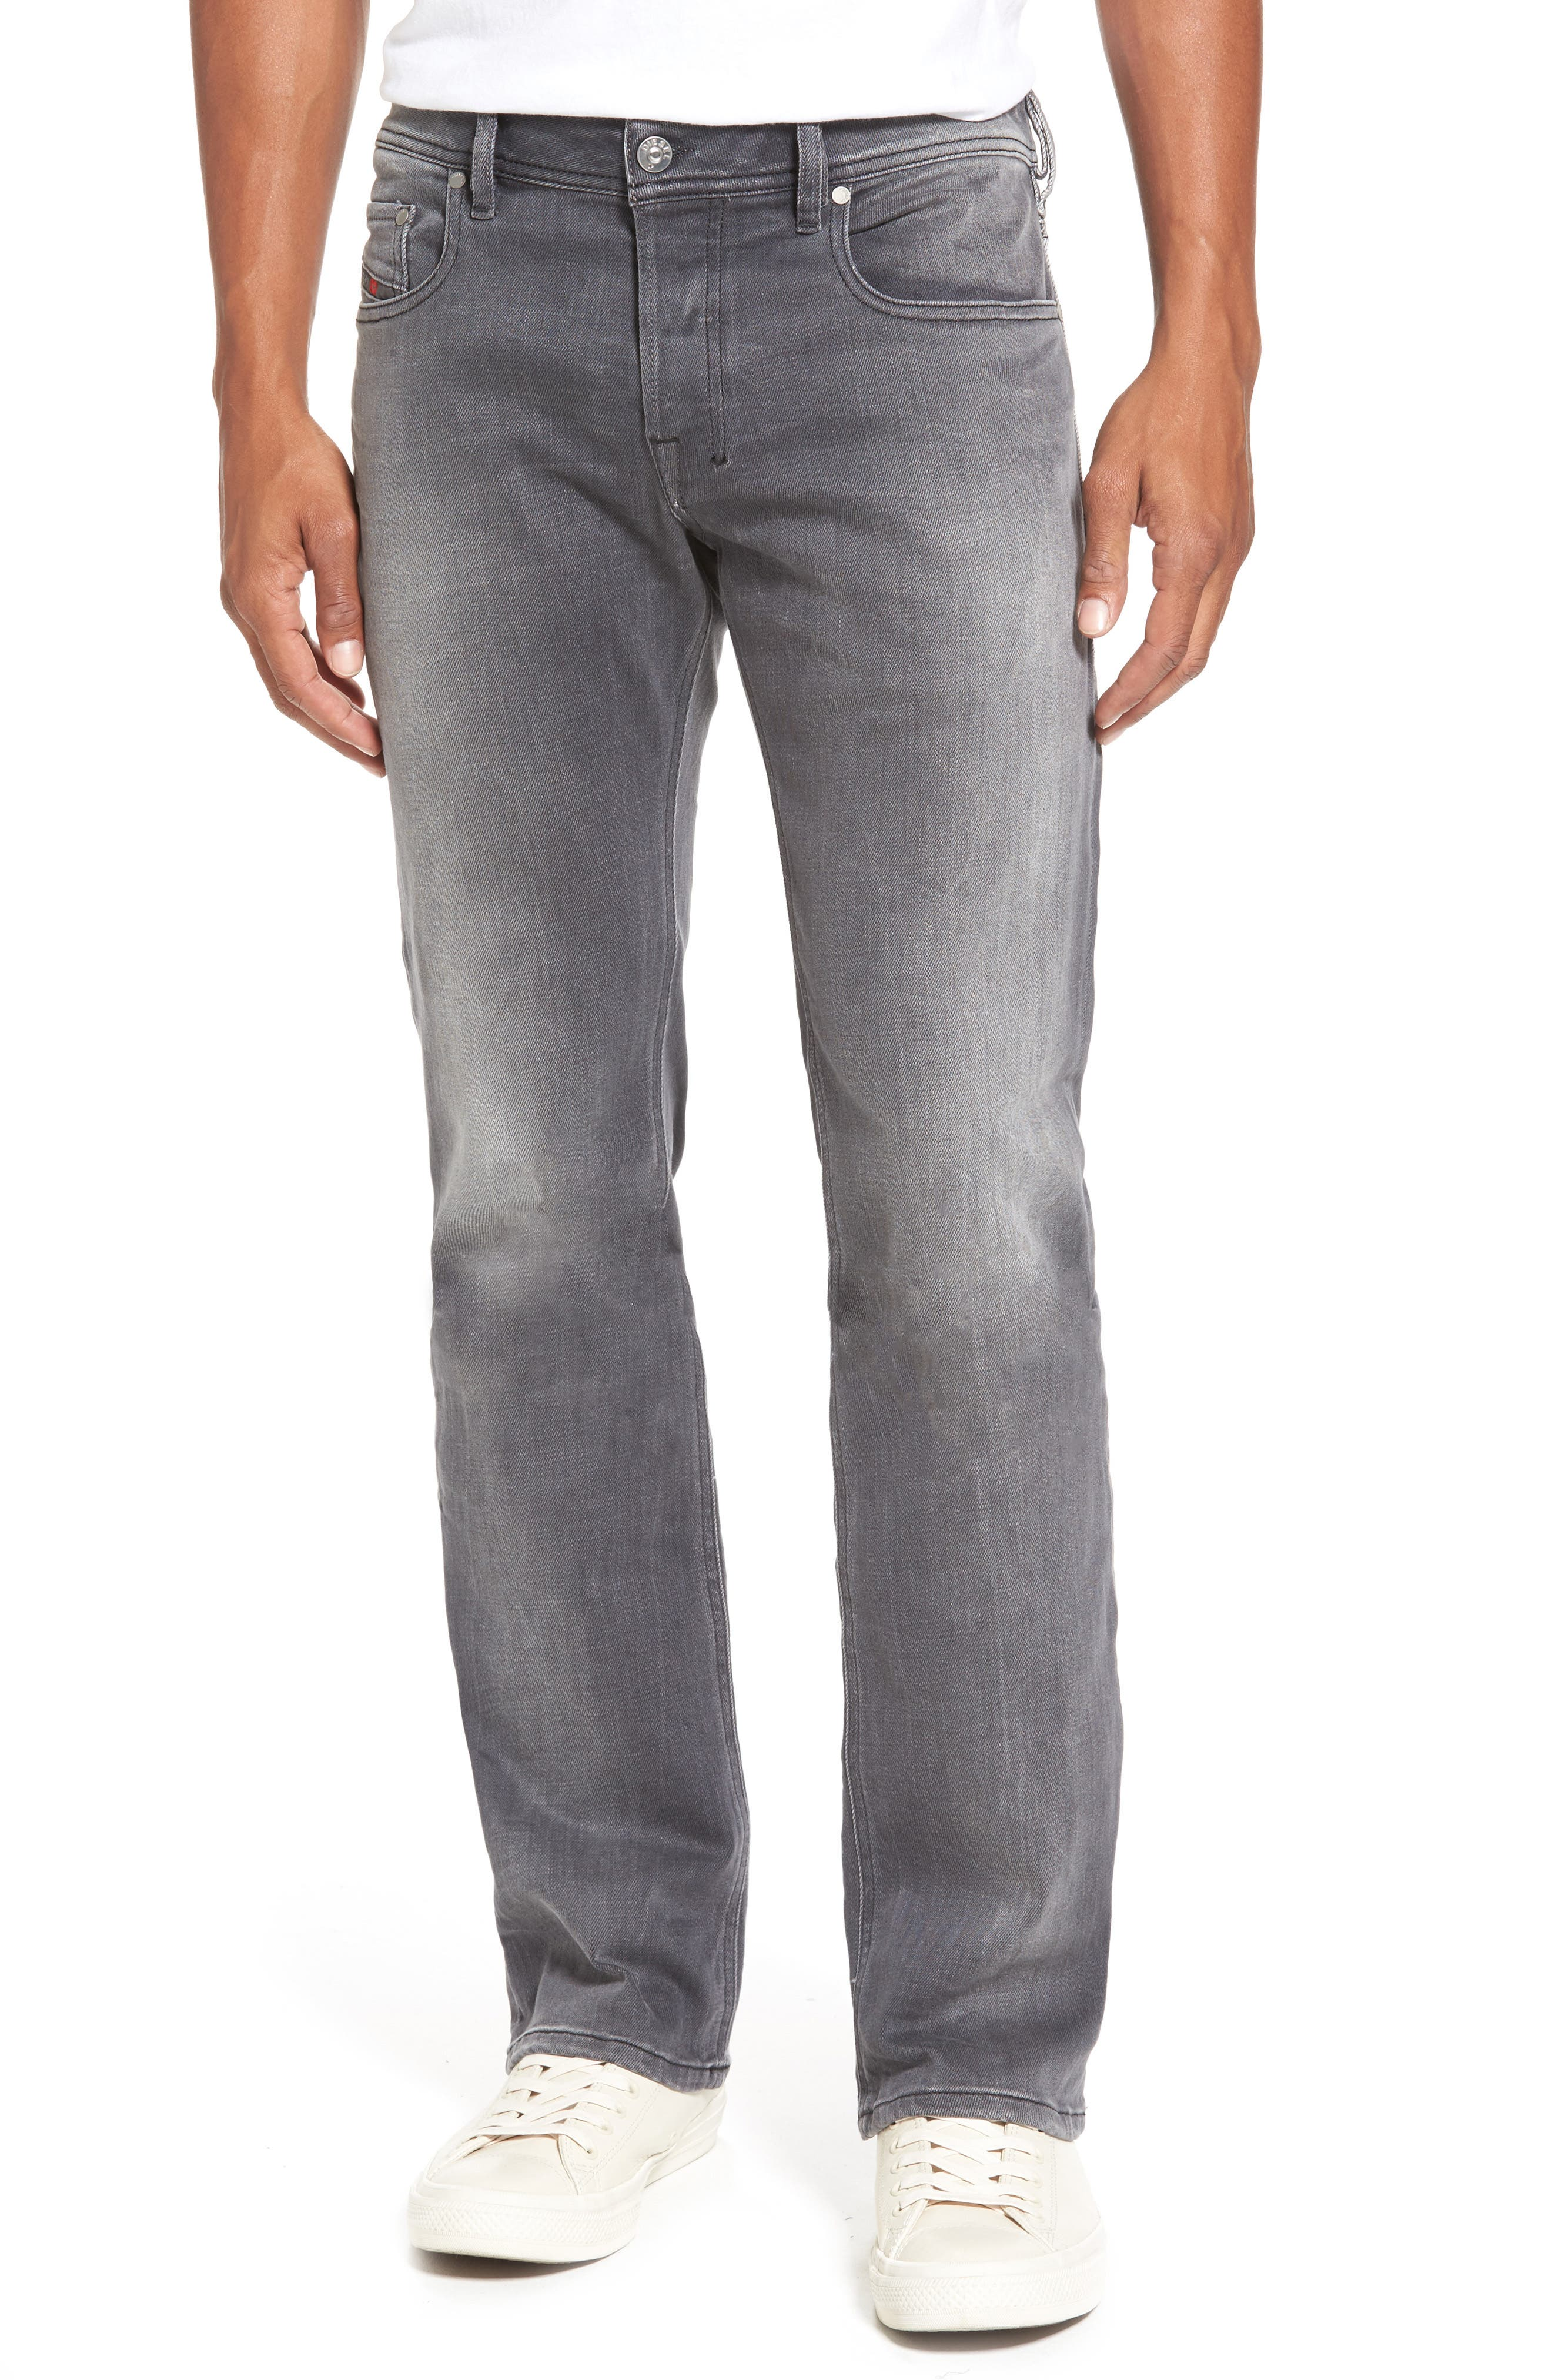 Main Image - DIESEL® Zatiny Bootcut Jeans (84JK)